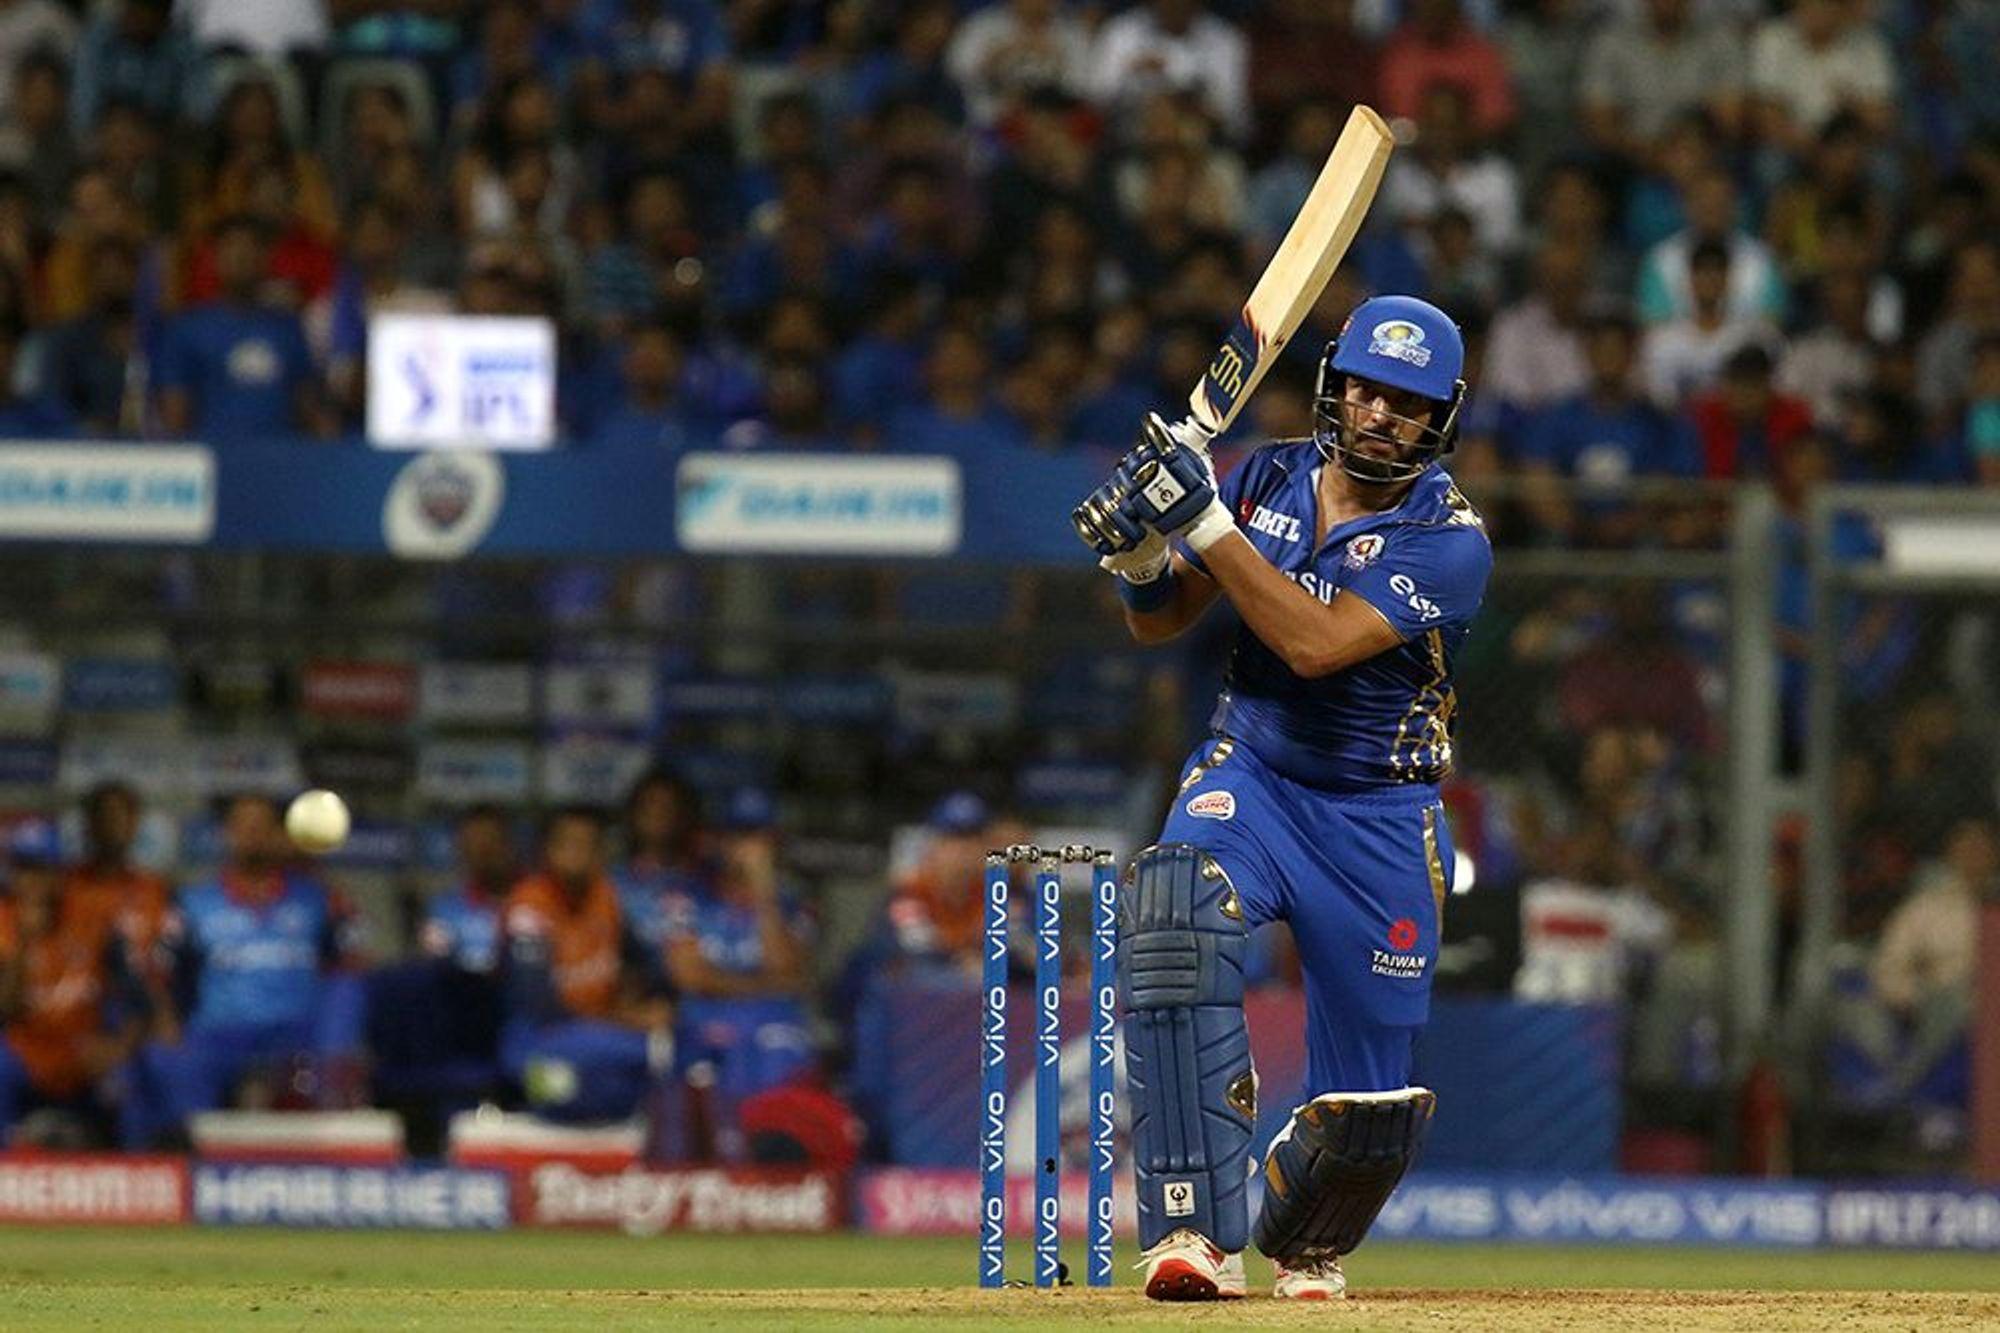 Yuvraj Singh, IPL, Retirement, Sports, Cricket, NewsMobile, Mobile, News, India